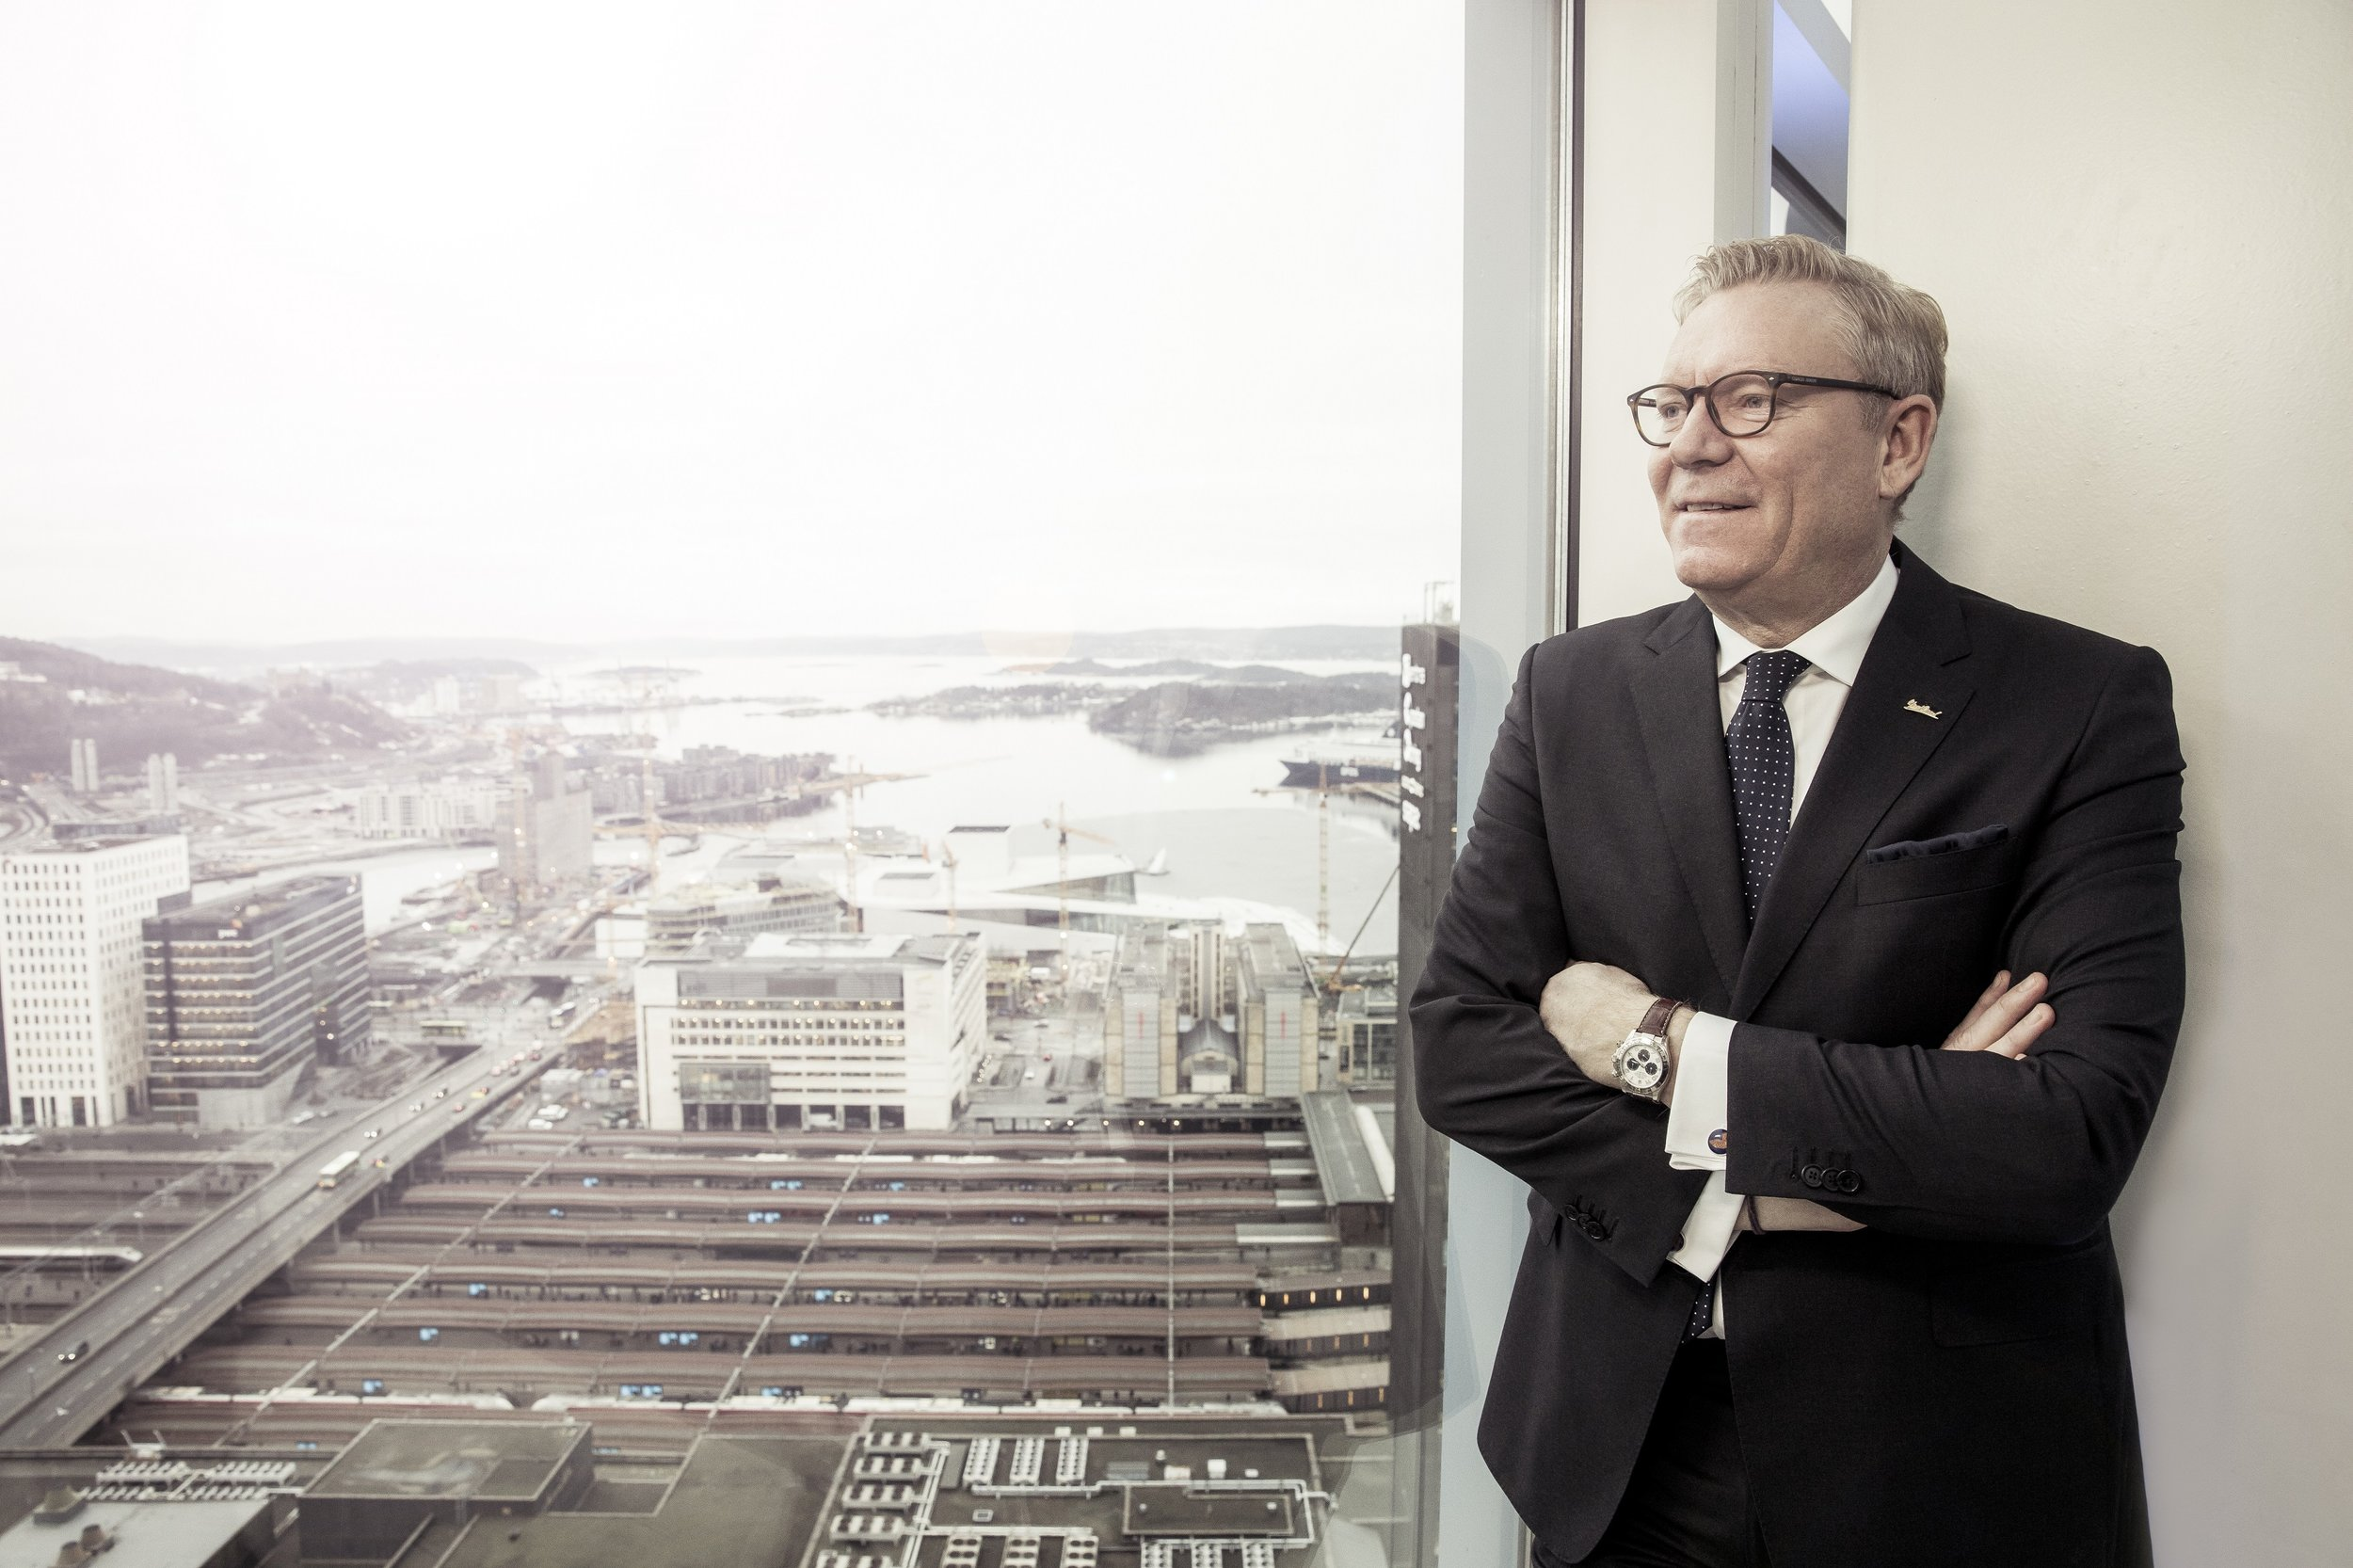 Administrerende direktør Tarje Hellebust ved Radisson Blu Plaza Hotel. Foto - Rickard L. Eriksson